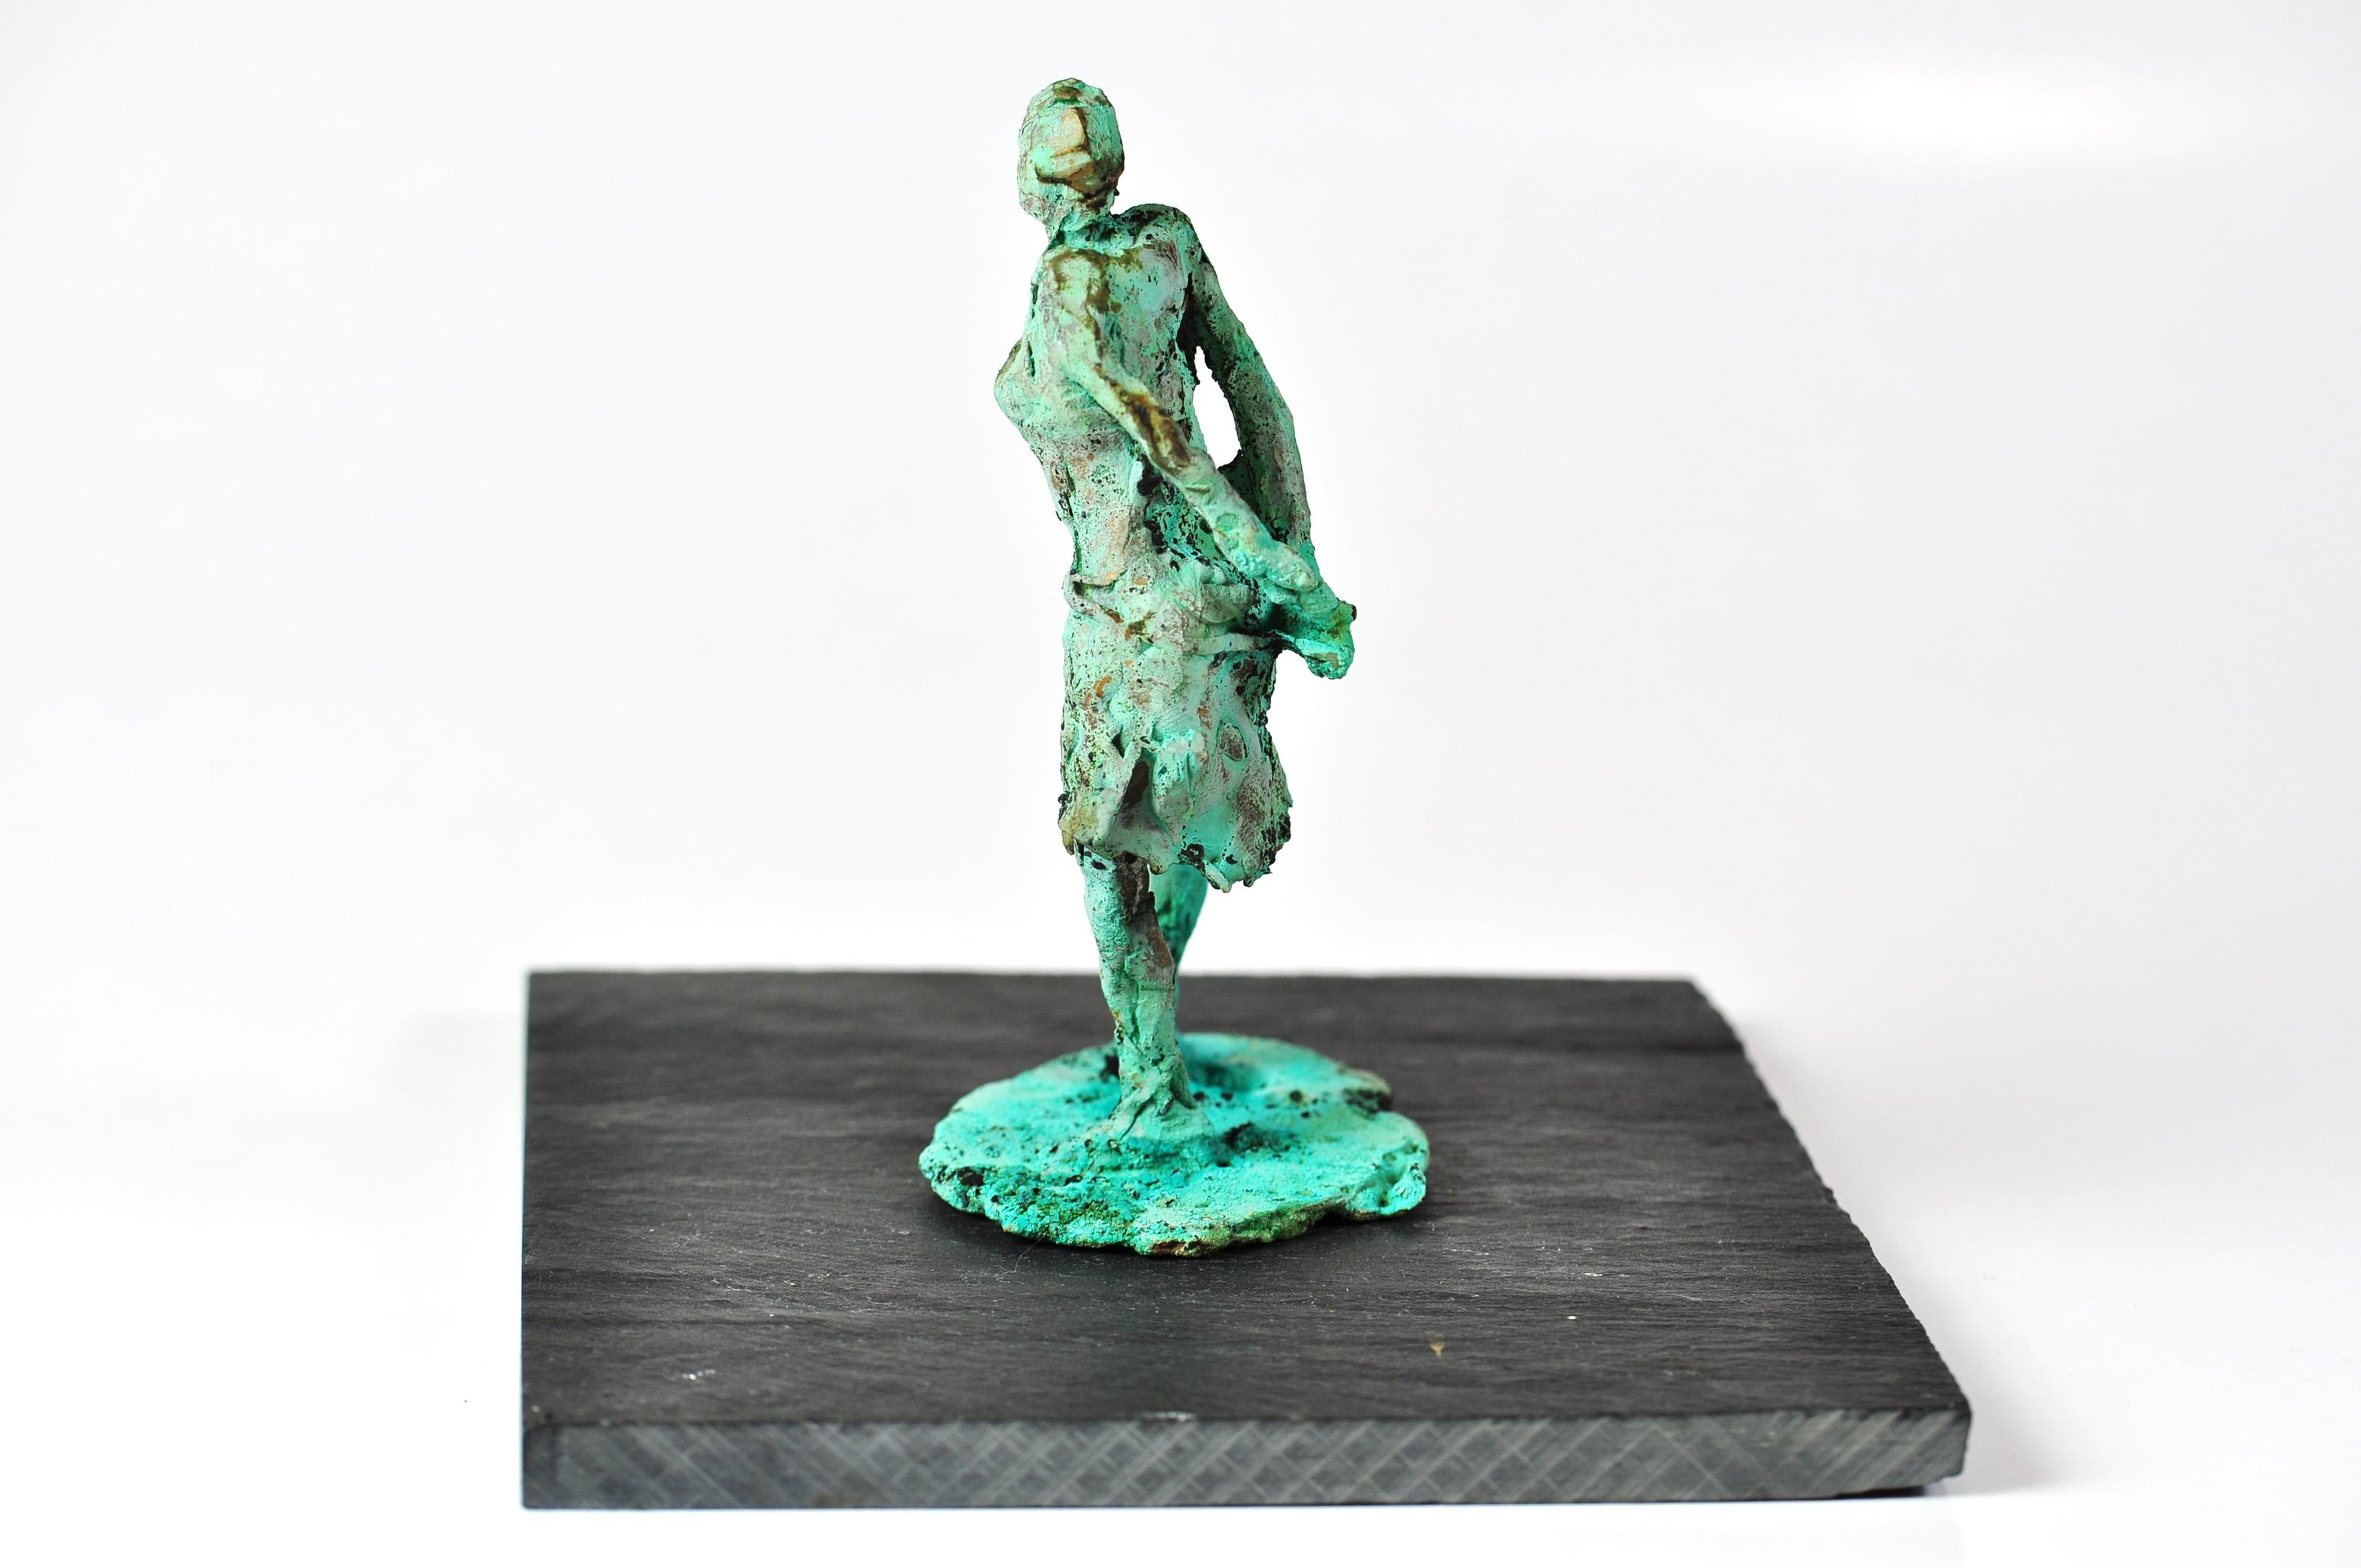 Bronzeskulptur støbt cire perdu